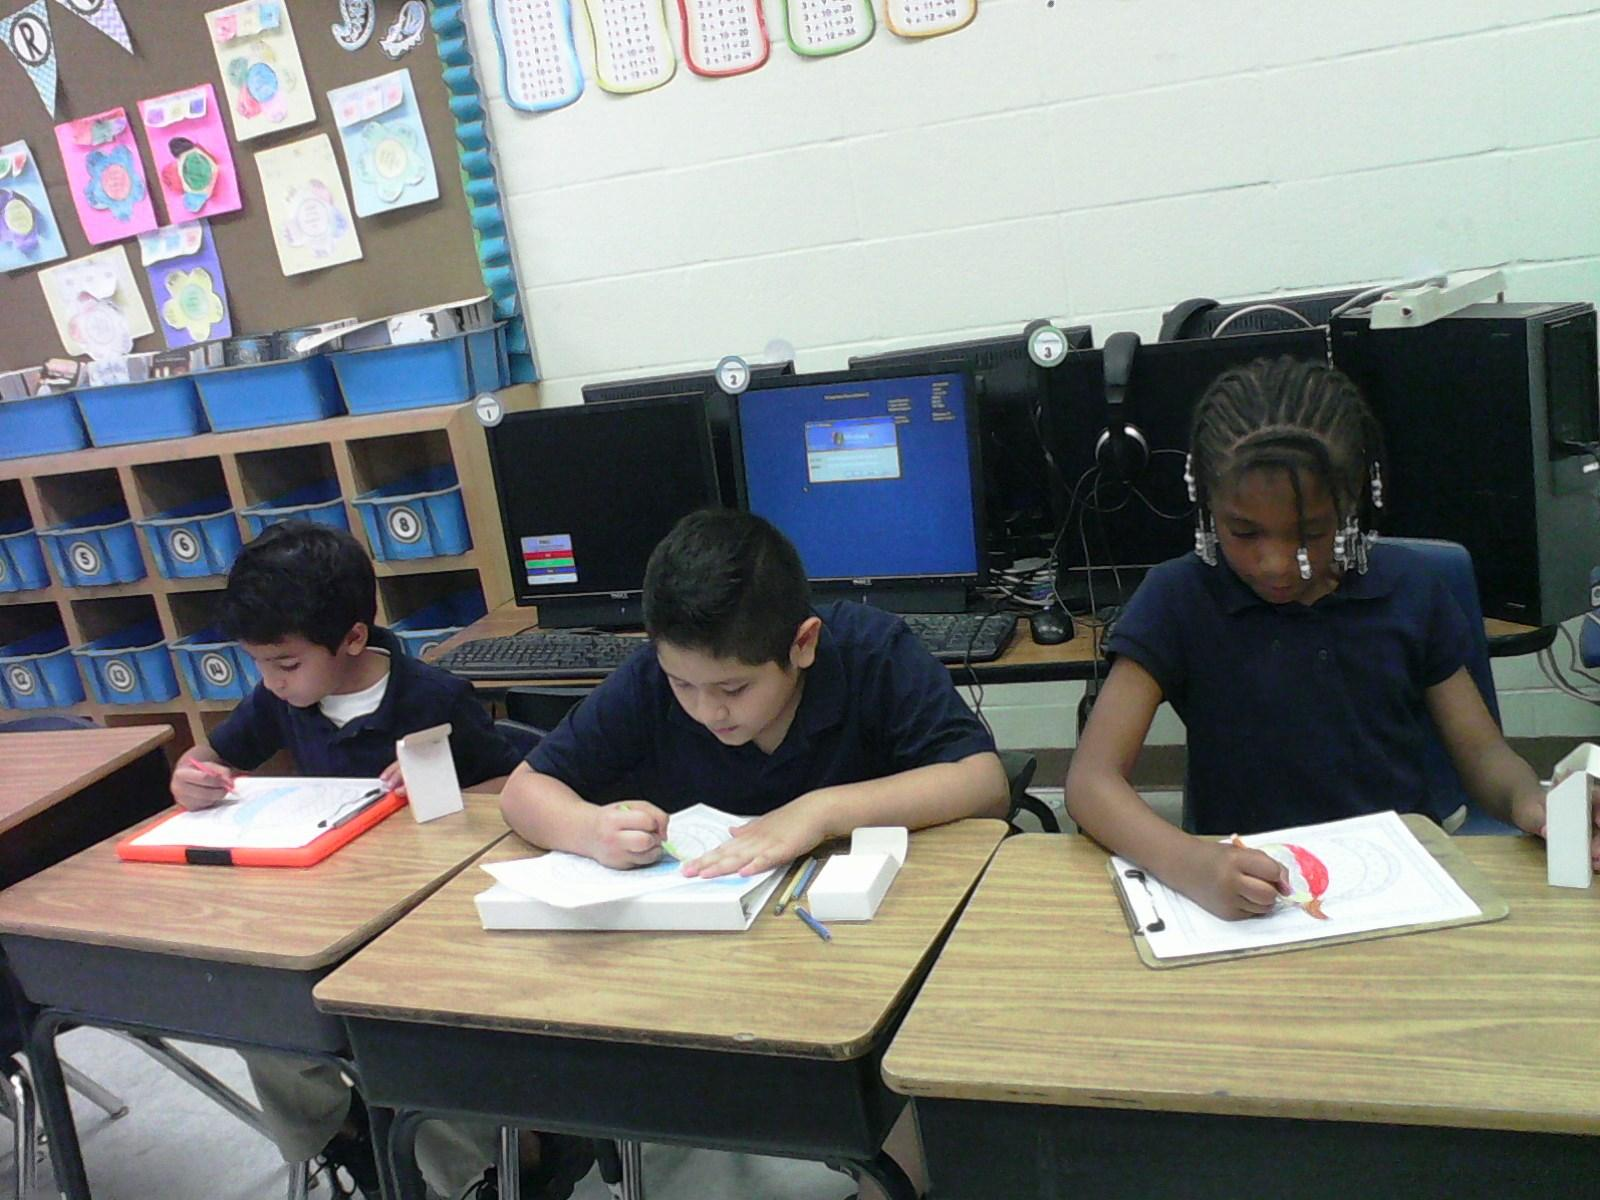 Louisiana Kids Back To Learning Thanks to Crayola